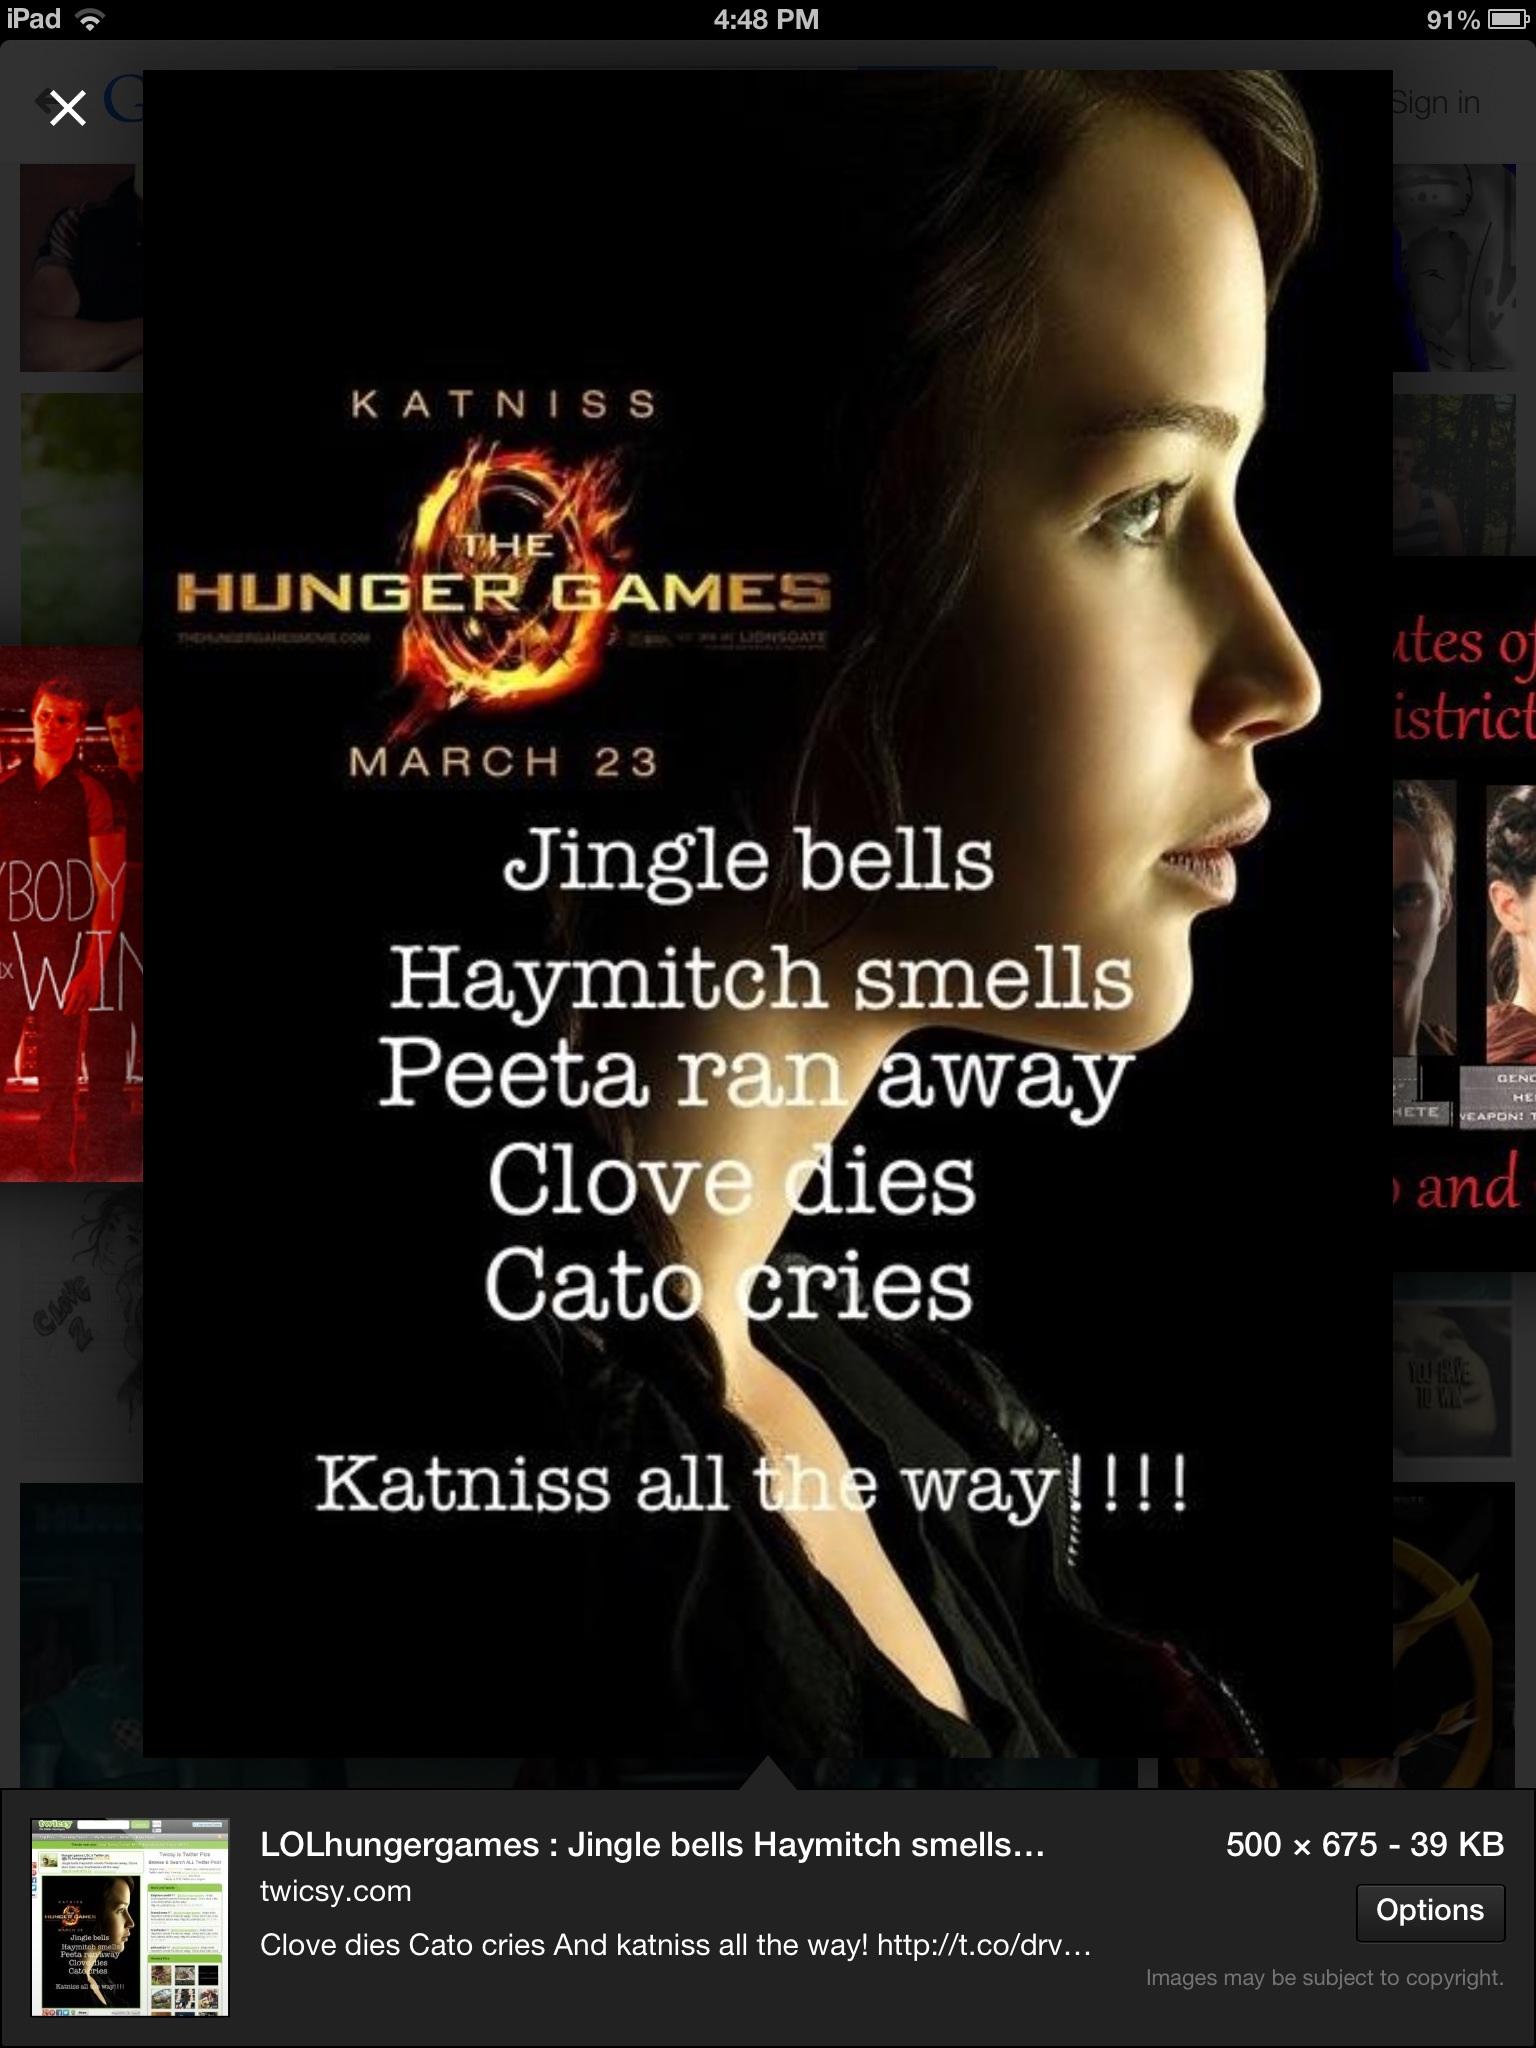 Fandom Meme Reactions! - The Hunger Games - Wattpad